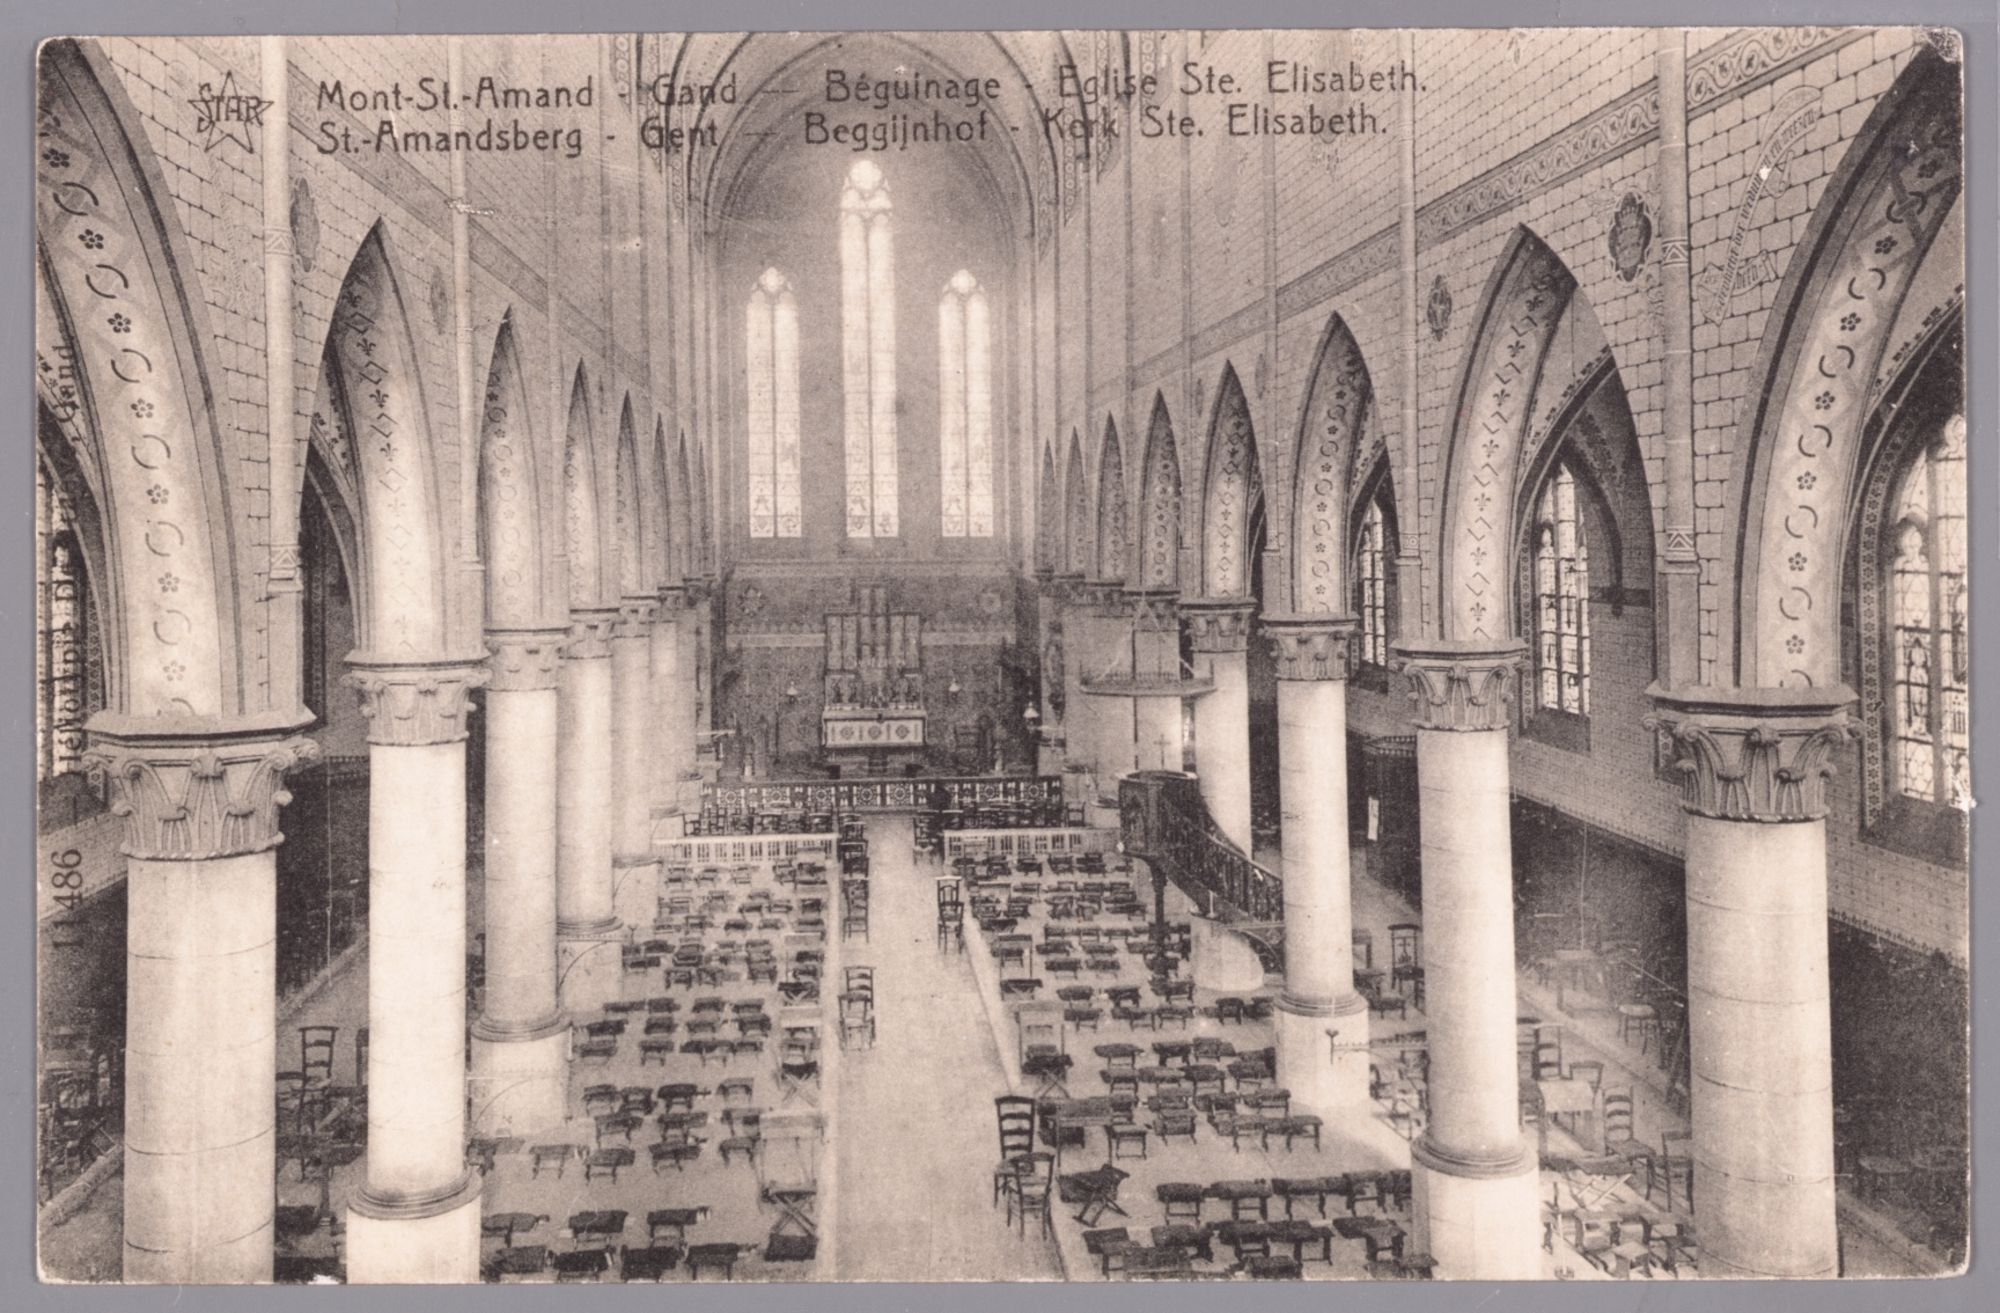 Sint-Amandsberg: Groot Begijnhof: binnenzicht Sint-Elisabethkerk